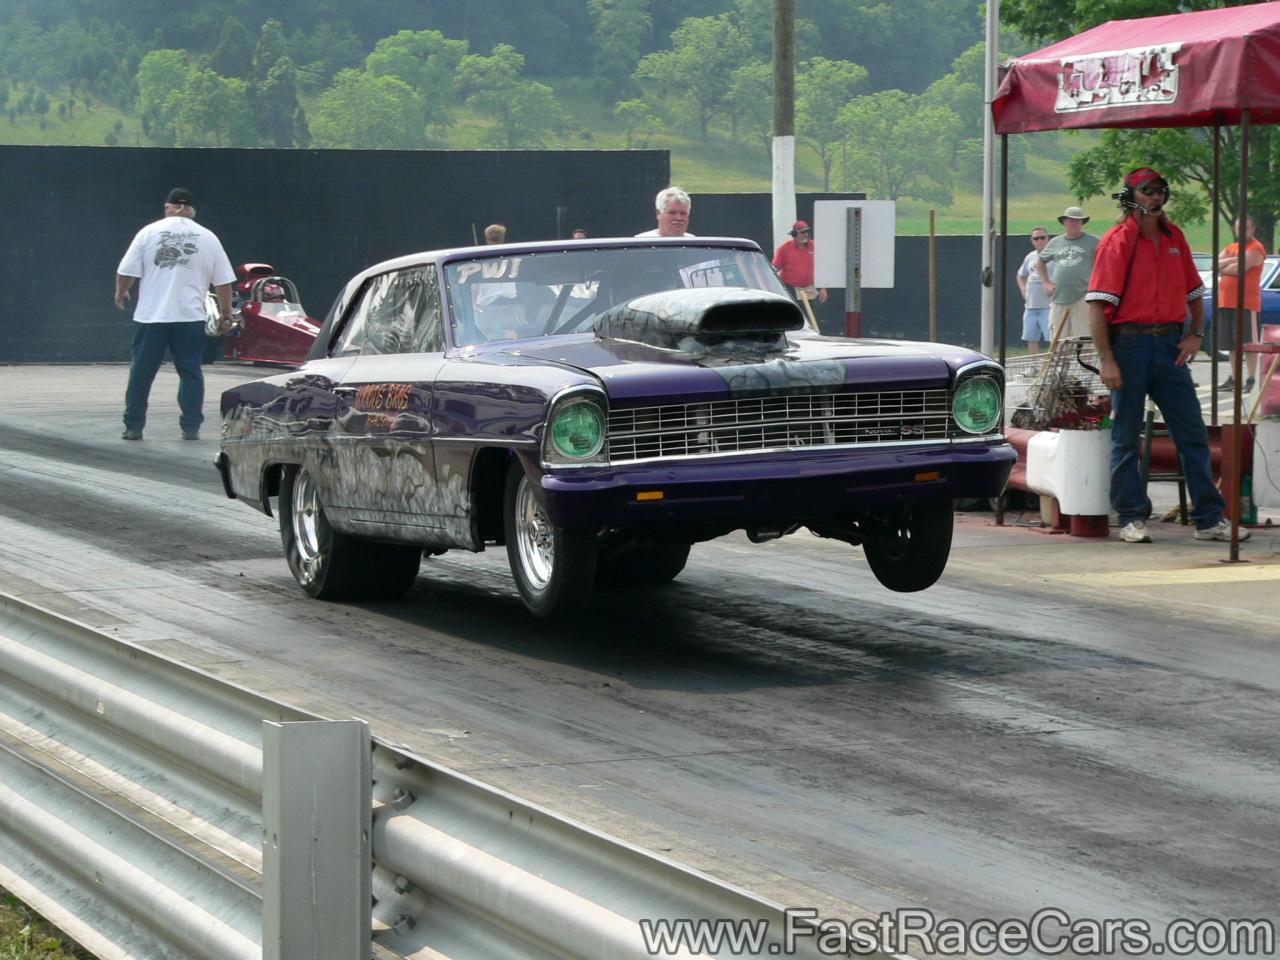 Purple Nova Drag Car Popping Wheelie